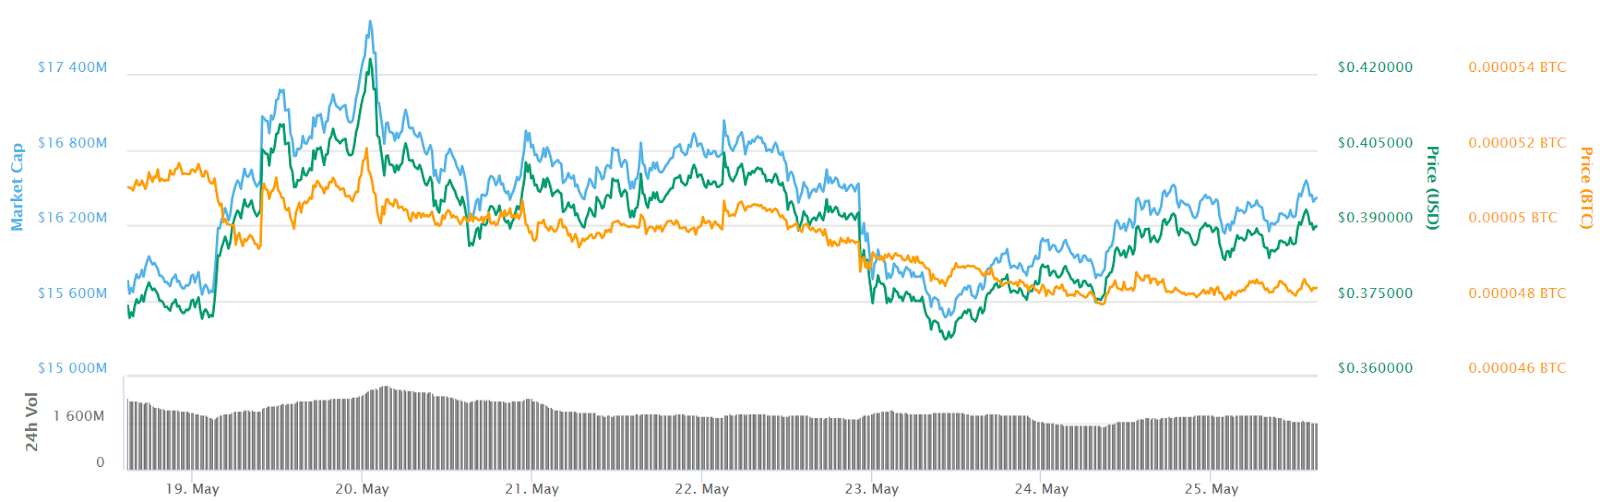 Gráfico de precios de 7 días de XRP